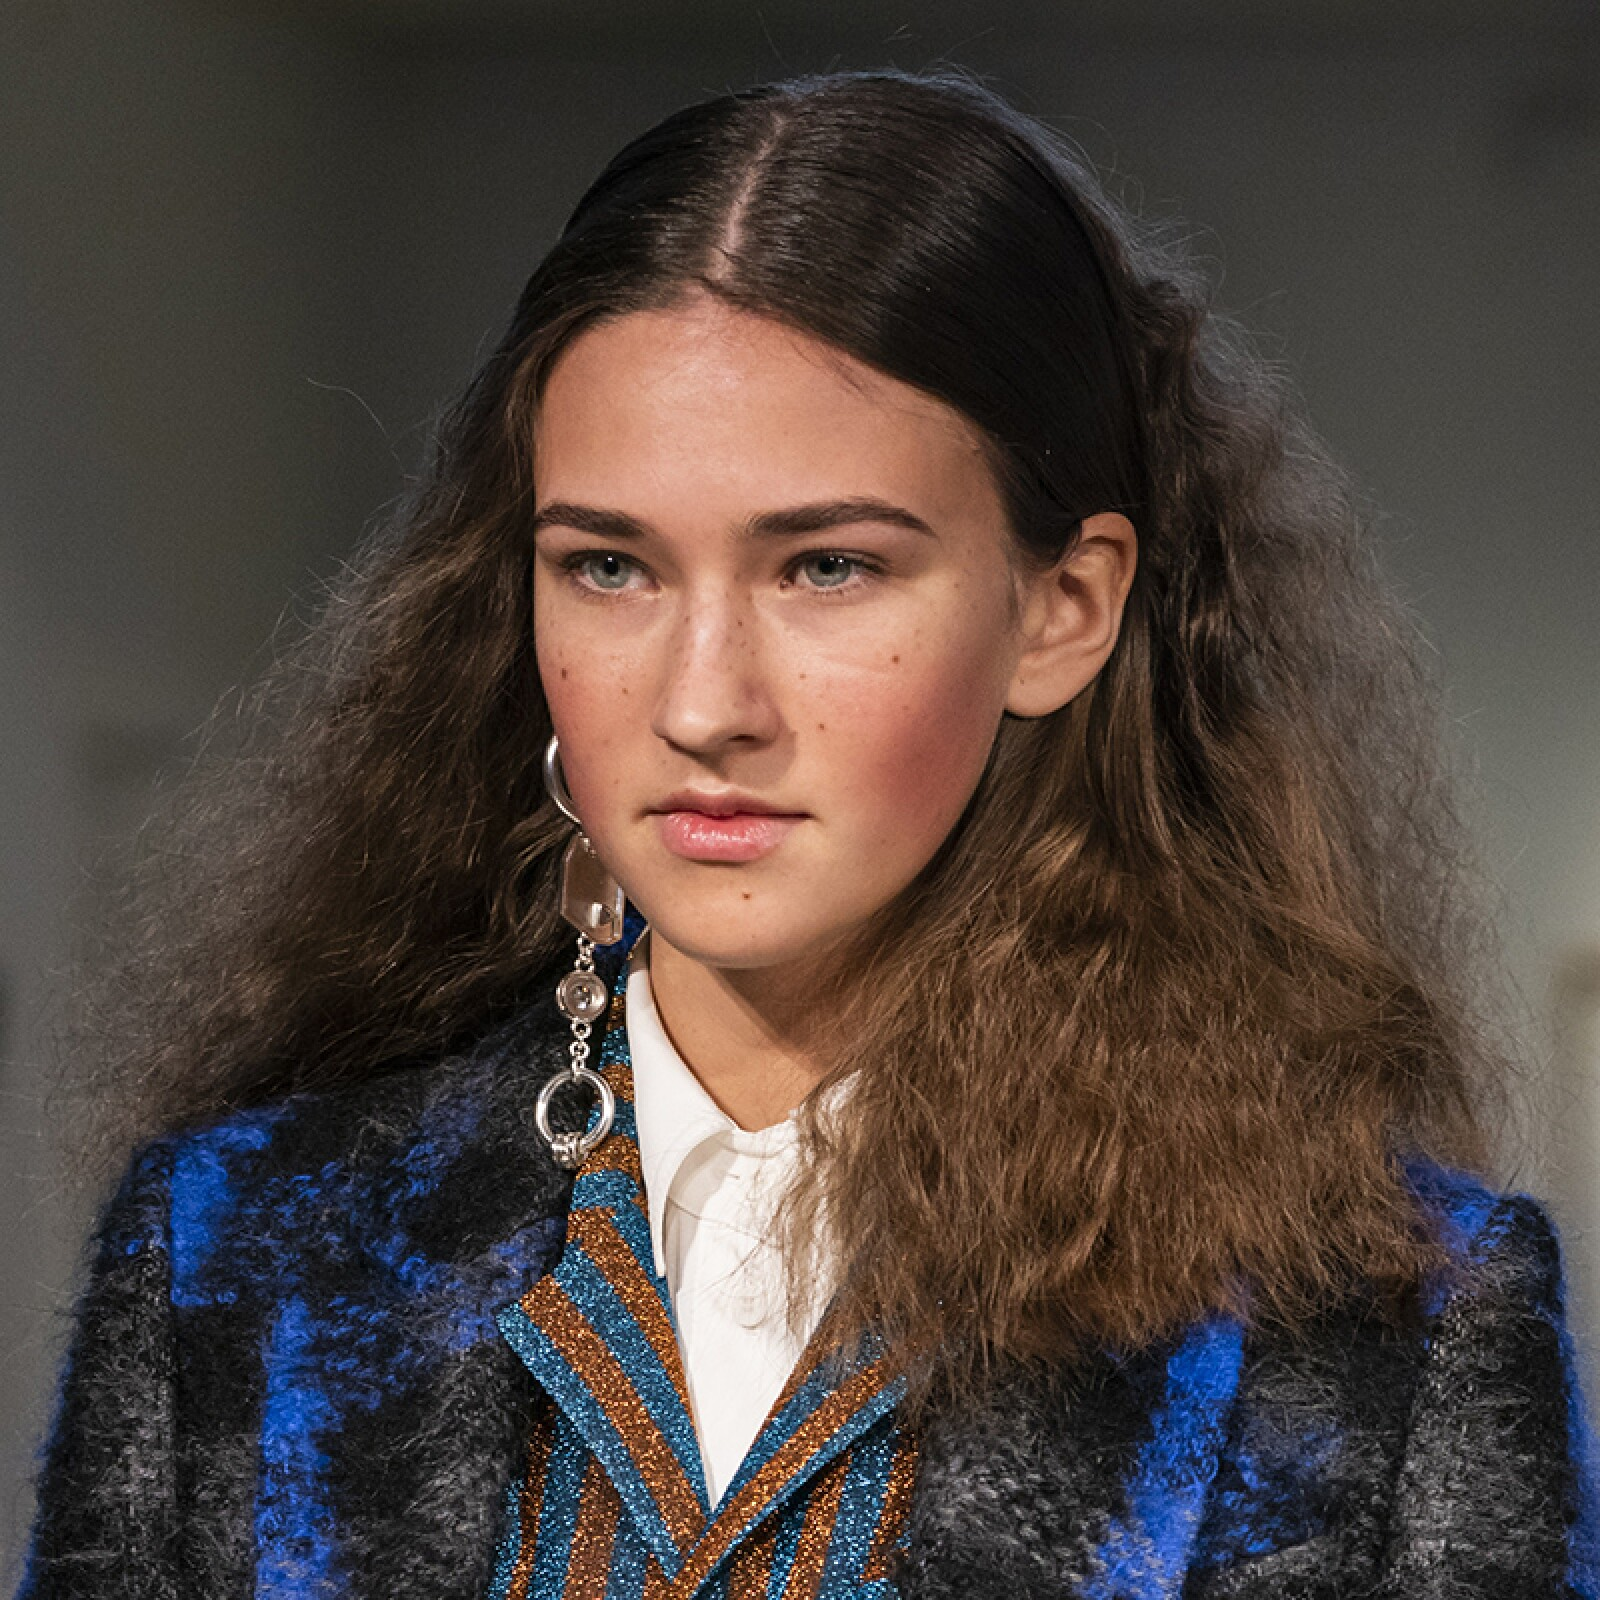 lfw-fashion-week-runway-beauty-looks-maquillaje-jamieweihuang